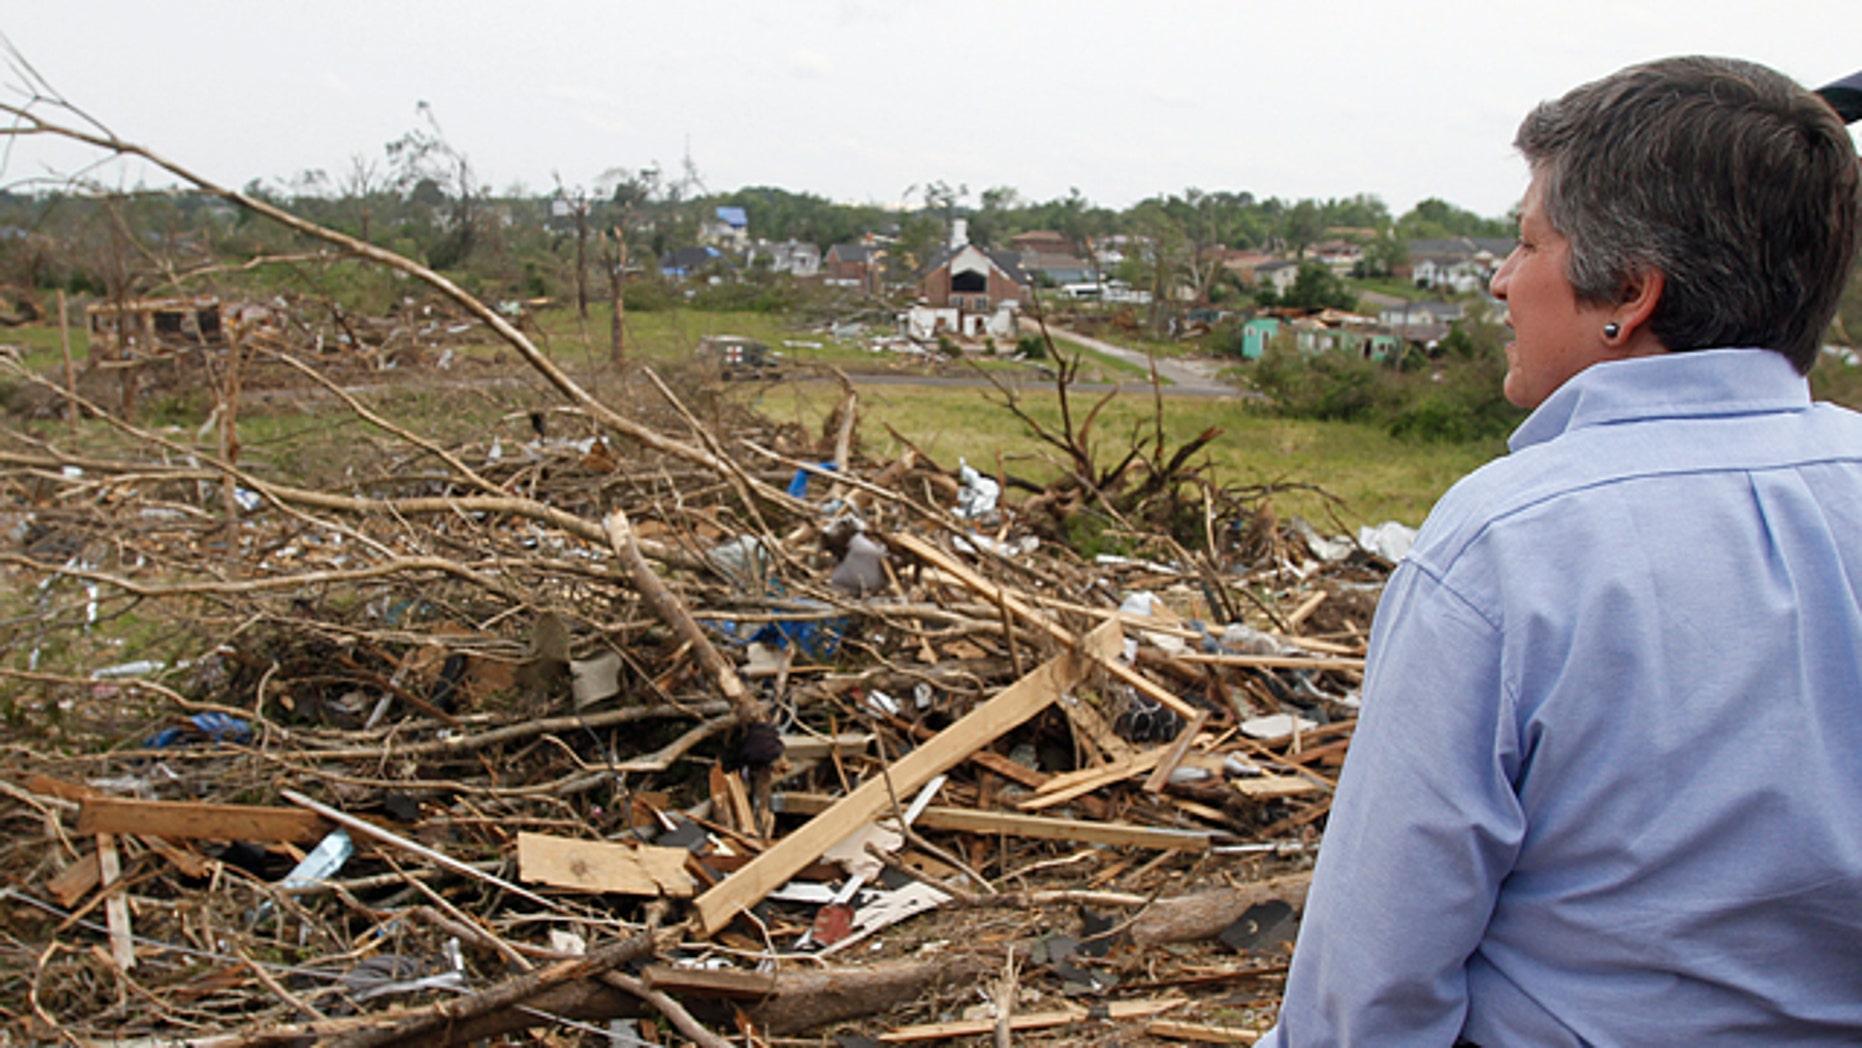 May 1: Homeland Security Secretary Janet Napolitano looks over the destruction where a tornado ripped Pratt City